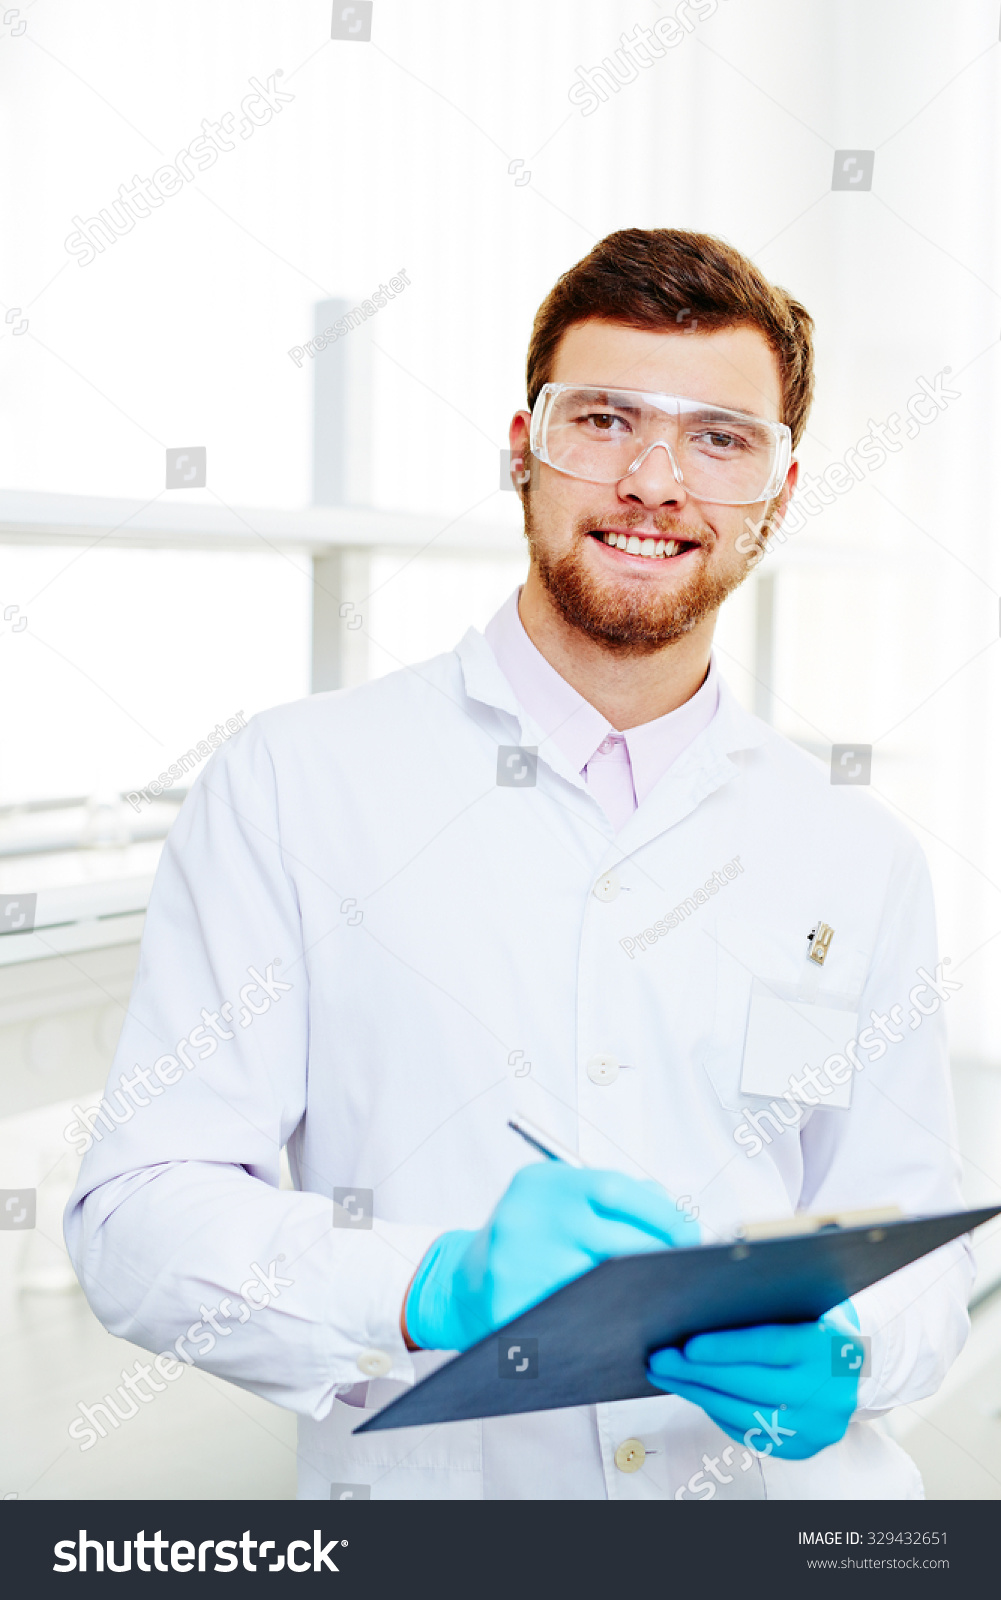 Handsome Chemist Whitecoat Eyeglasses Gloves Making Stock Photo ...